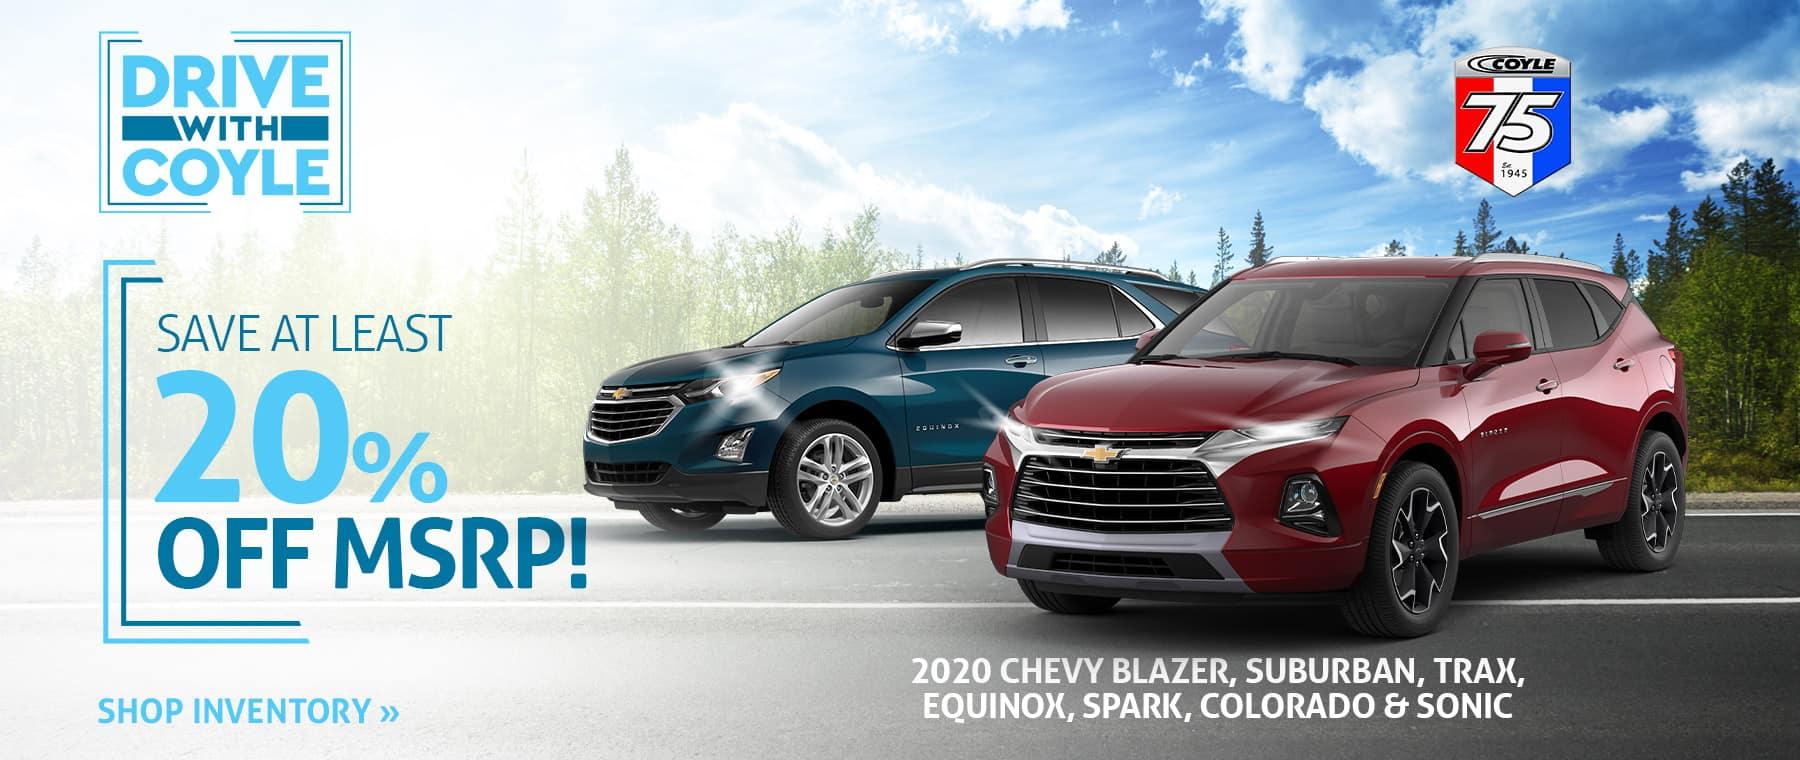 Best deal on new Chevrolets near Louisville, Kentucky